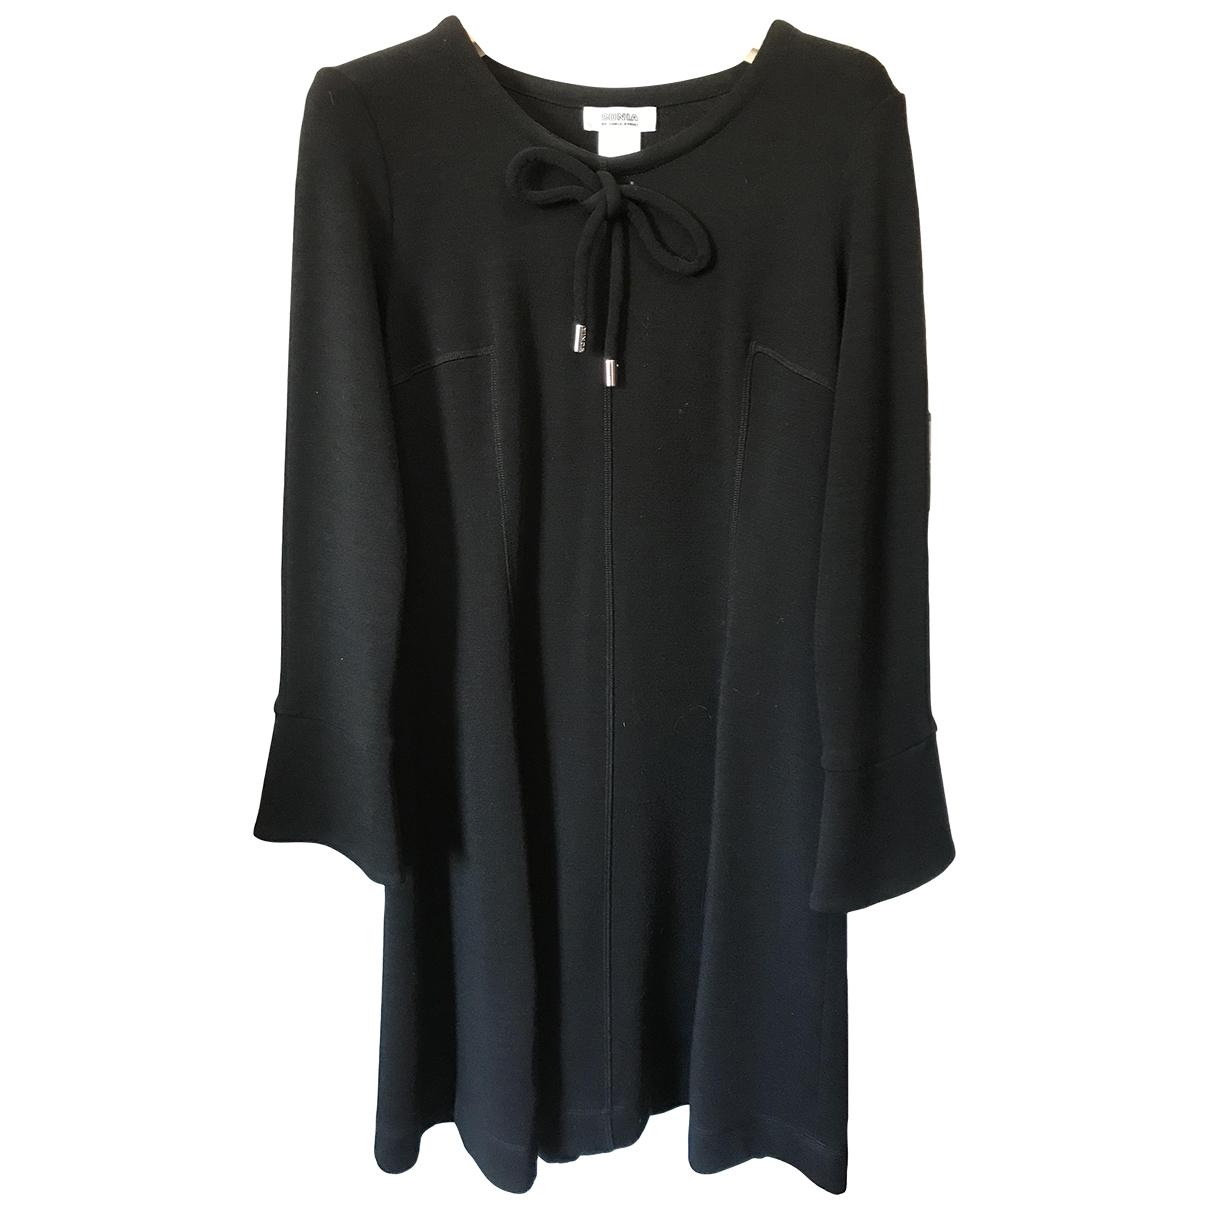 Vestido midi de Lana Sonia By Sonia Rykiel